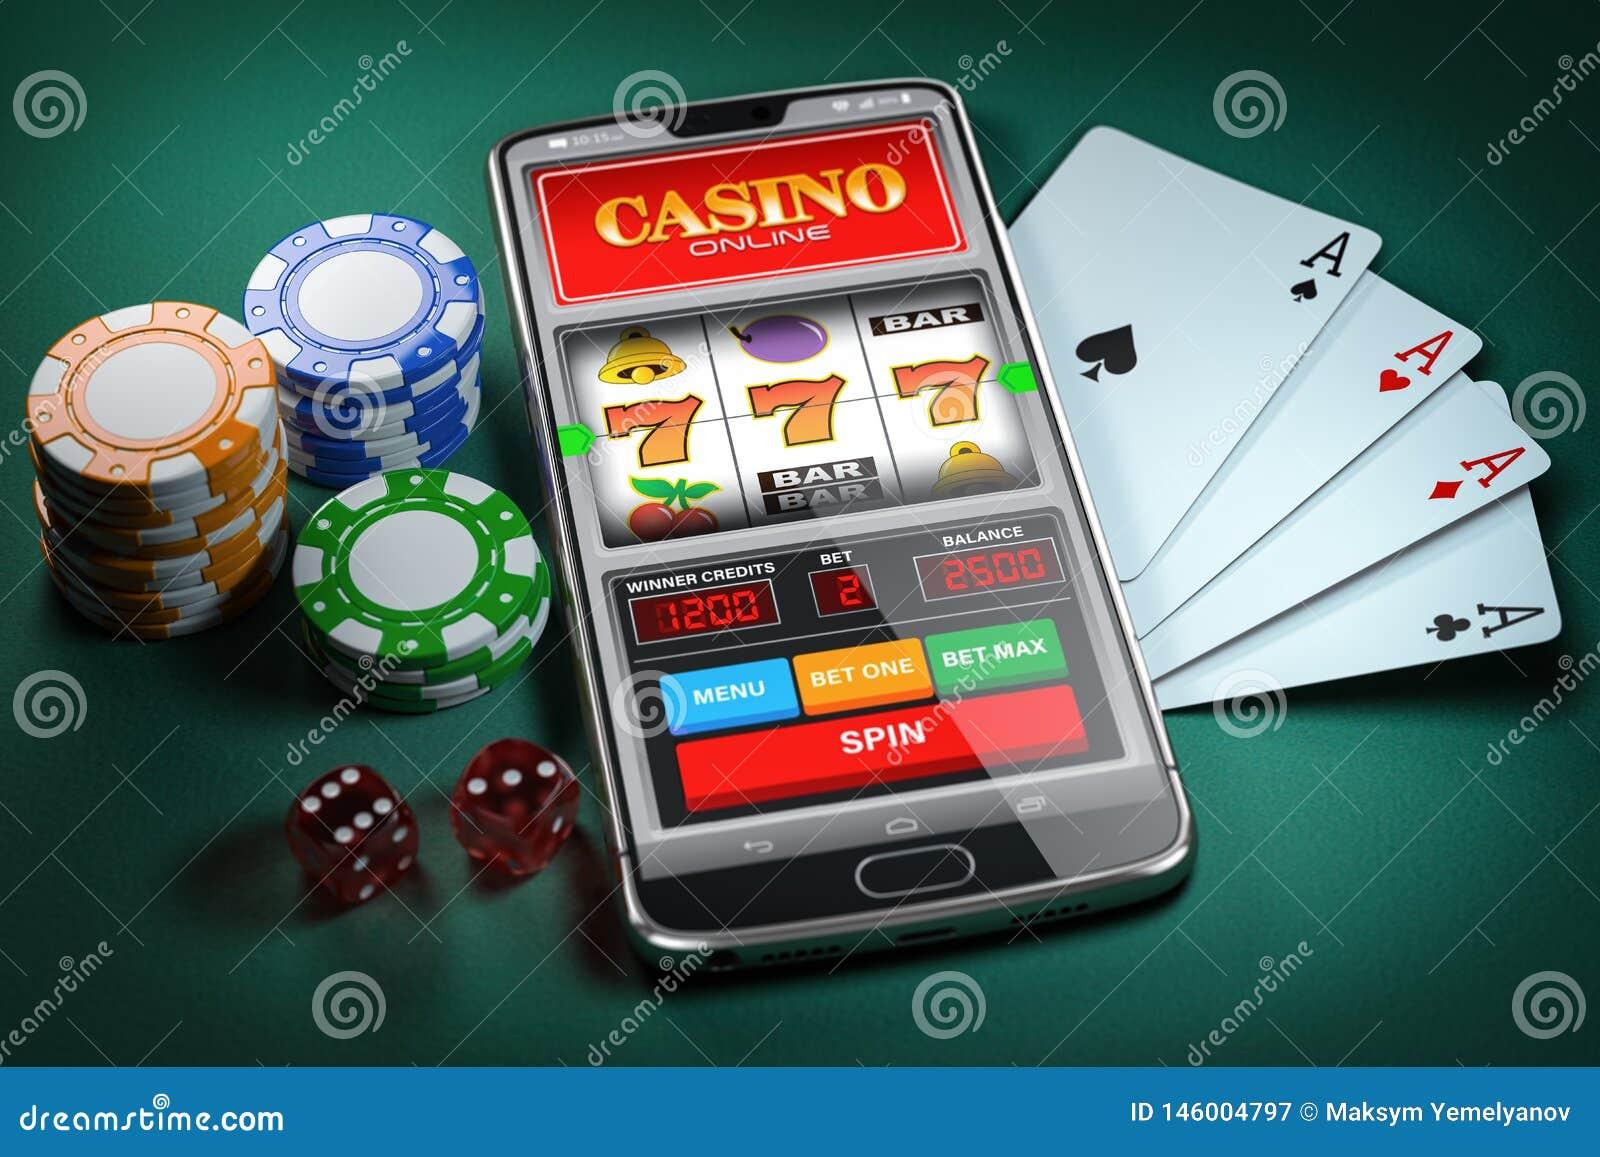 лобби интернет казино